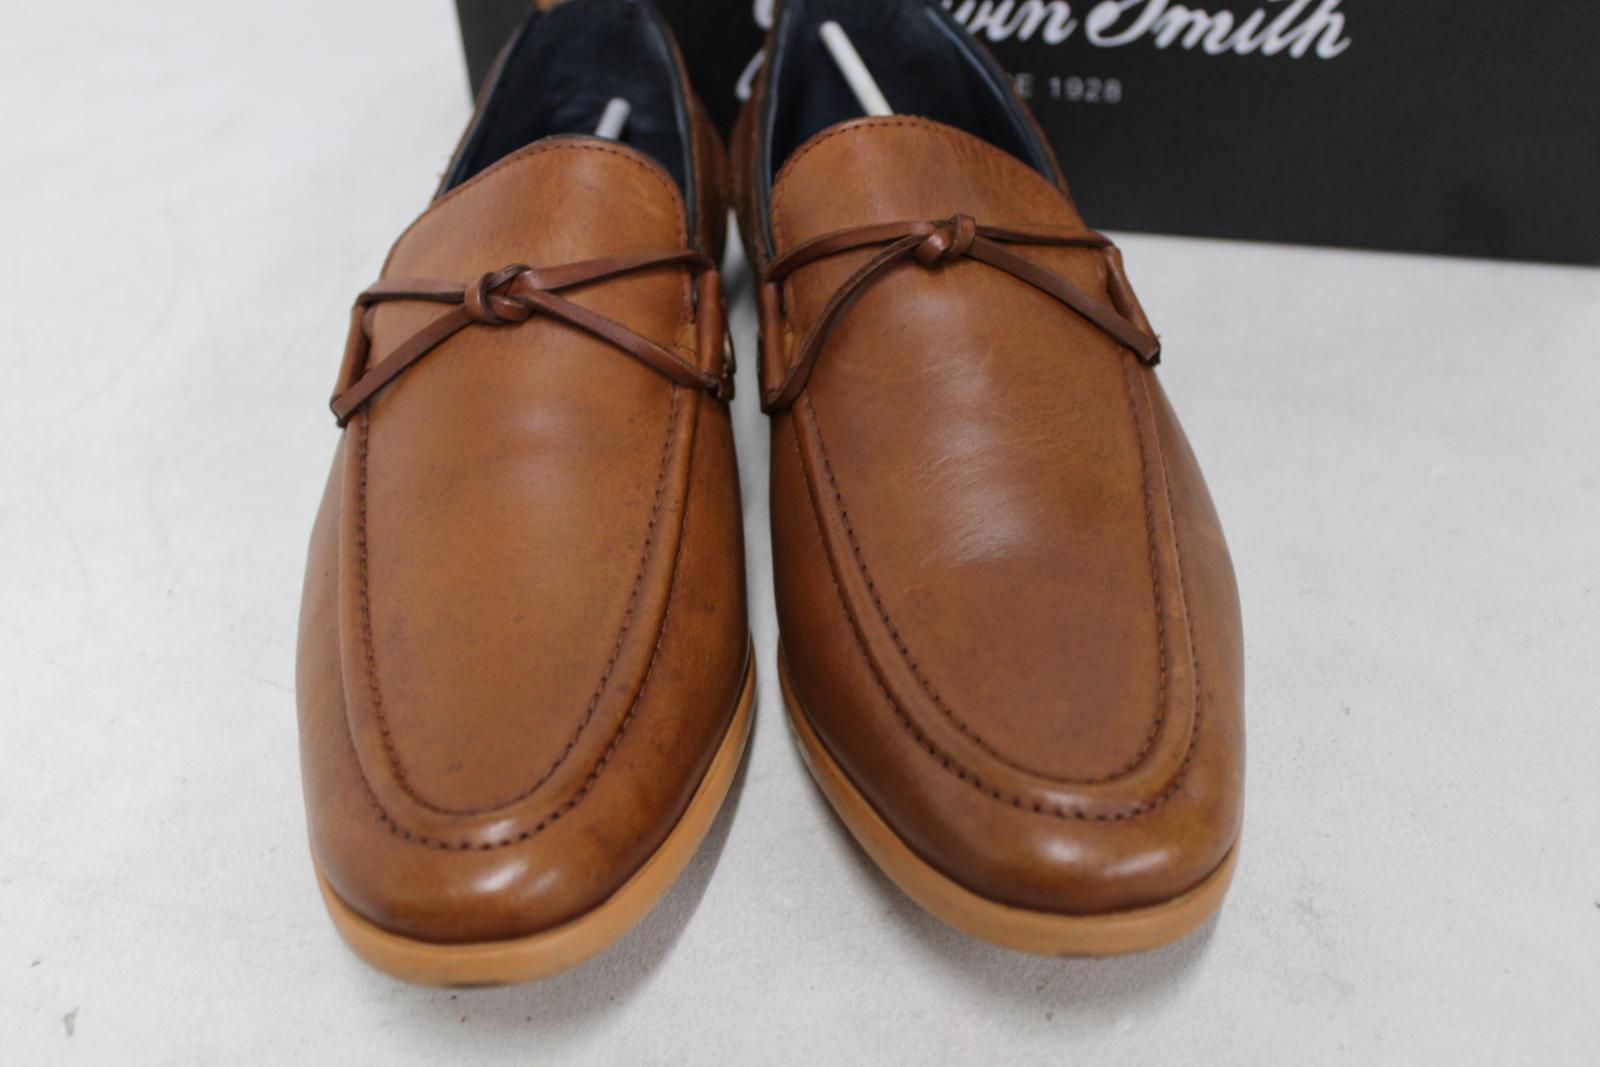 Goodwin-Smith-Para-Hombre-Napoli-Tanga-Zapato-Marron-Sin-Cordones-Mocasin-Cuero-UK8-EU42-Nuevo miniatura 8